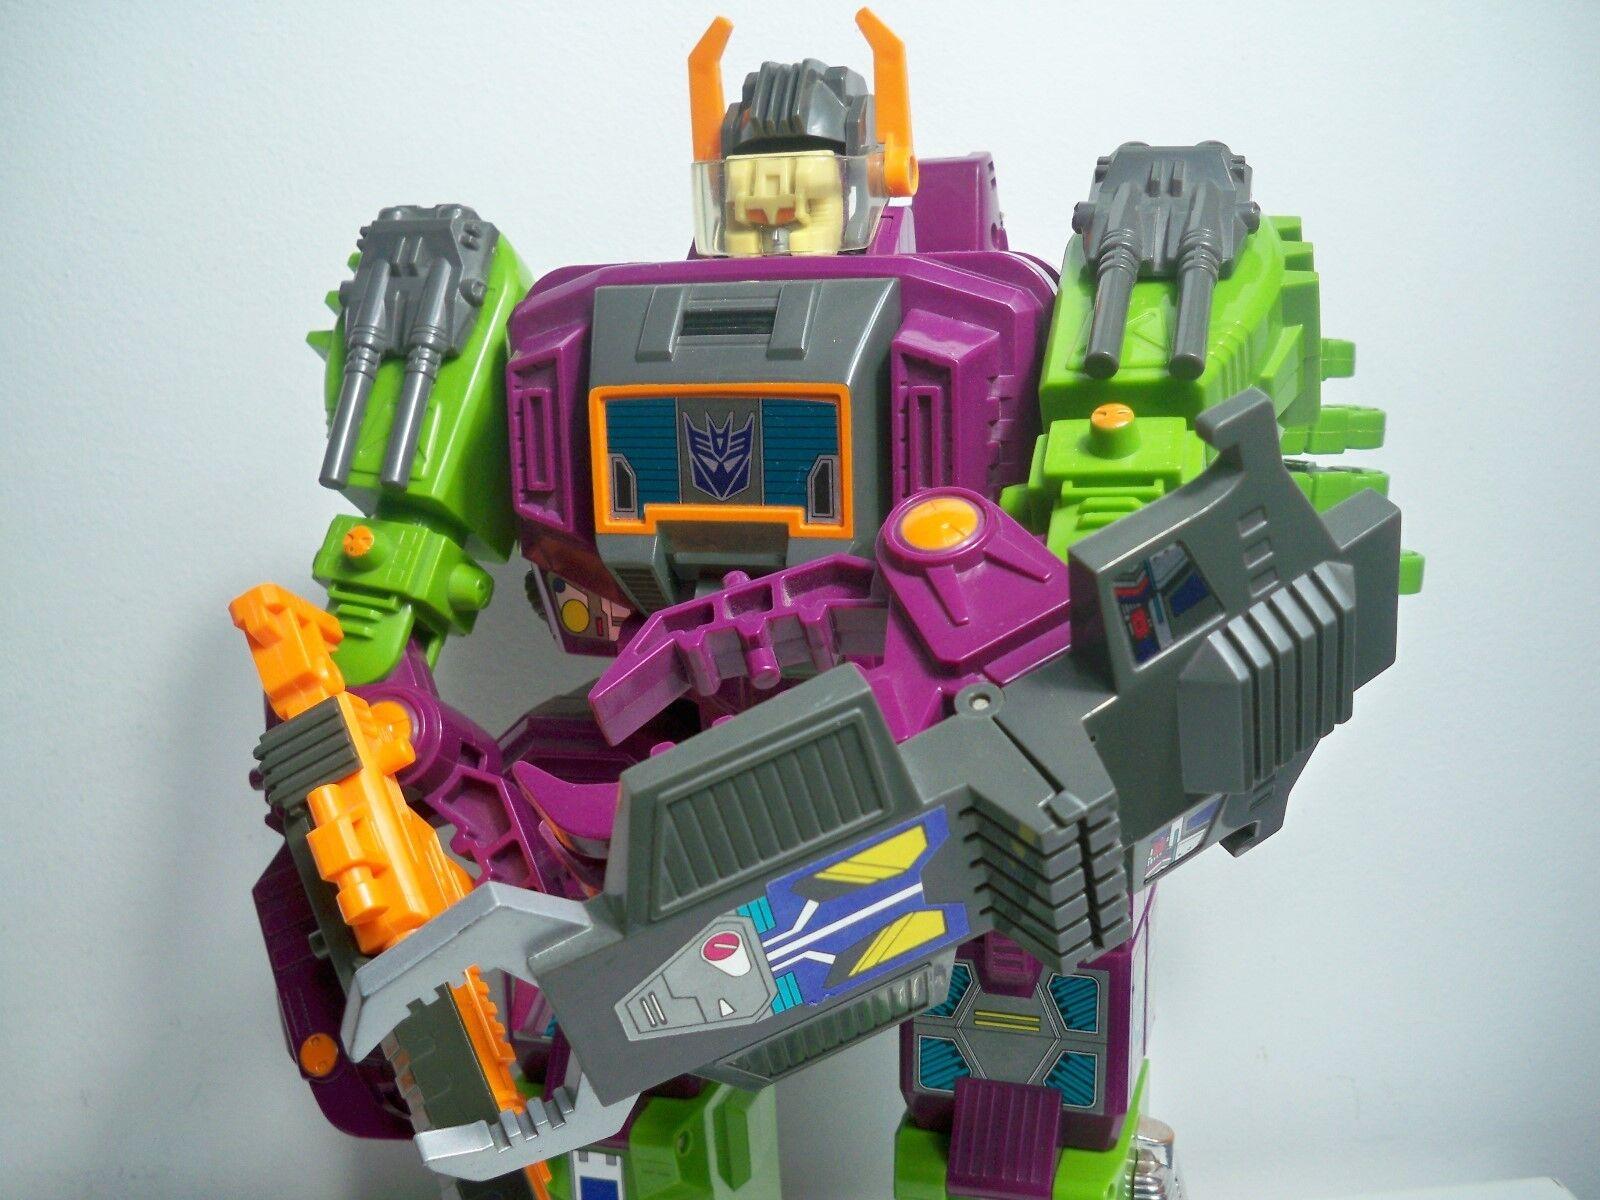 K1850533 scorponok loose 100% Complete Transformers G1 ORIGINAL 1987 Decepticon   détaillant de fitness